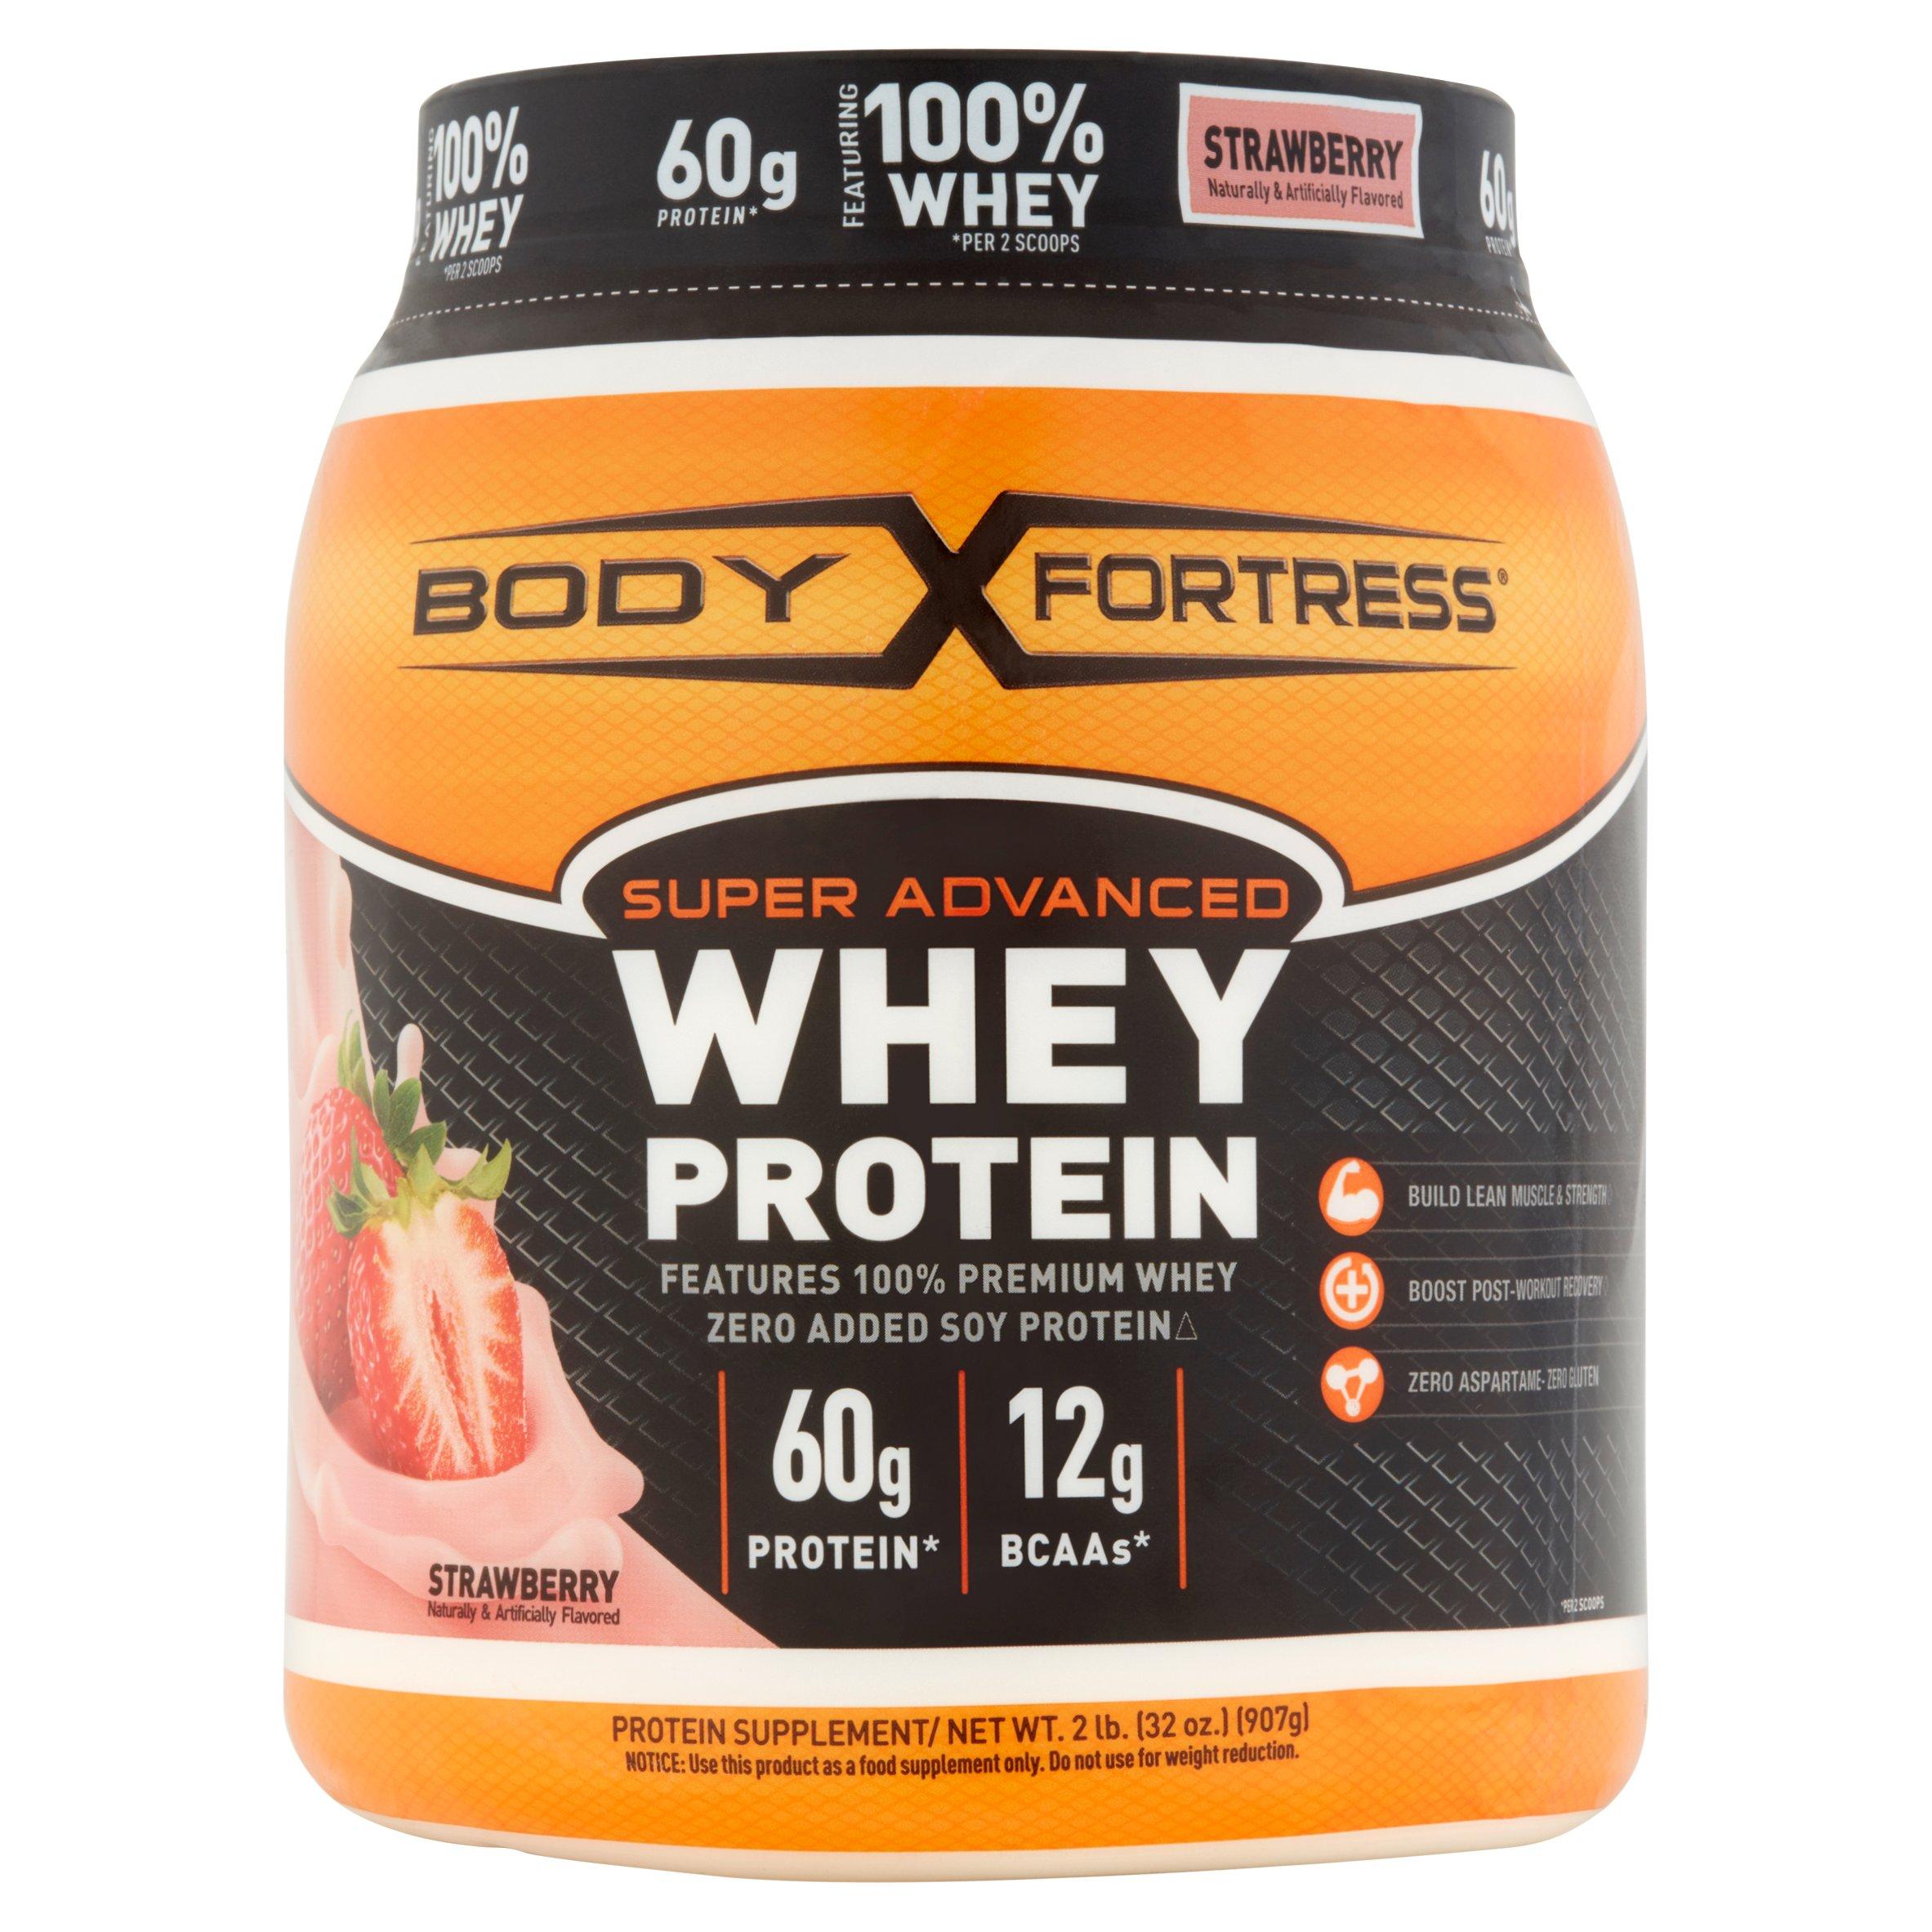 Body Fortress Super Advanced Whey Protein Powder, Strawberry, 60g Protein, 2 Lb